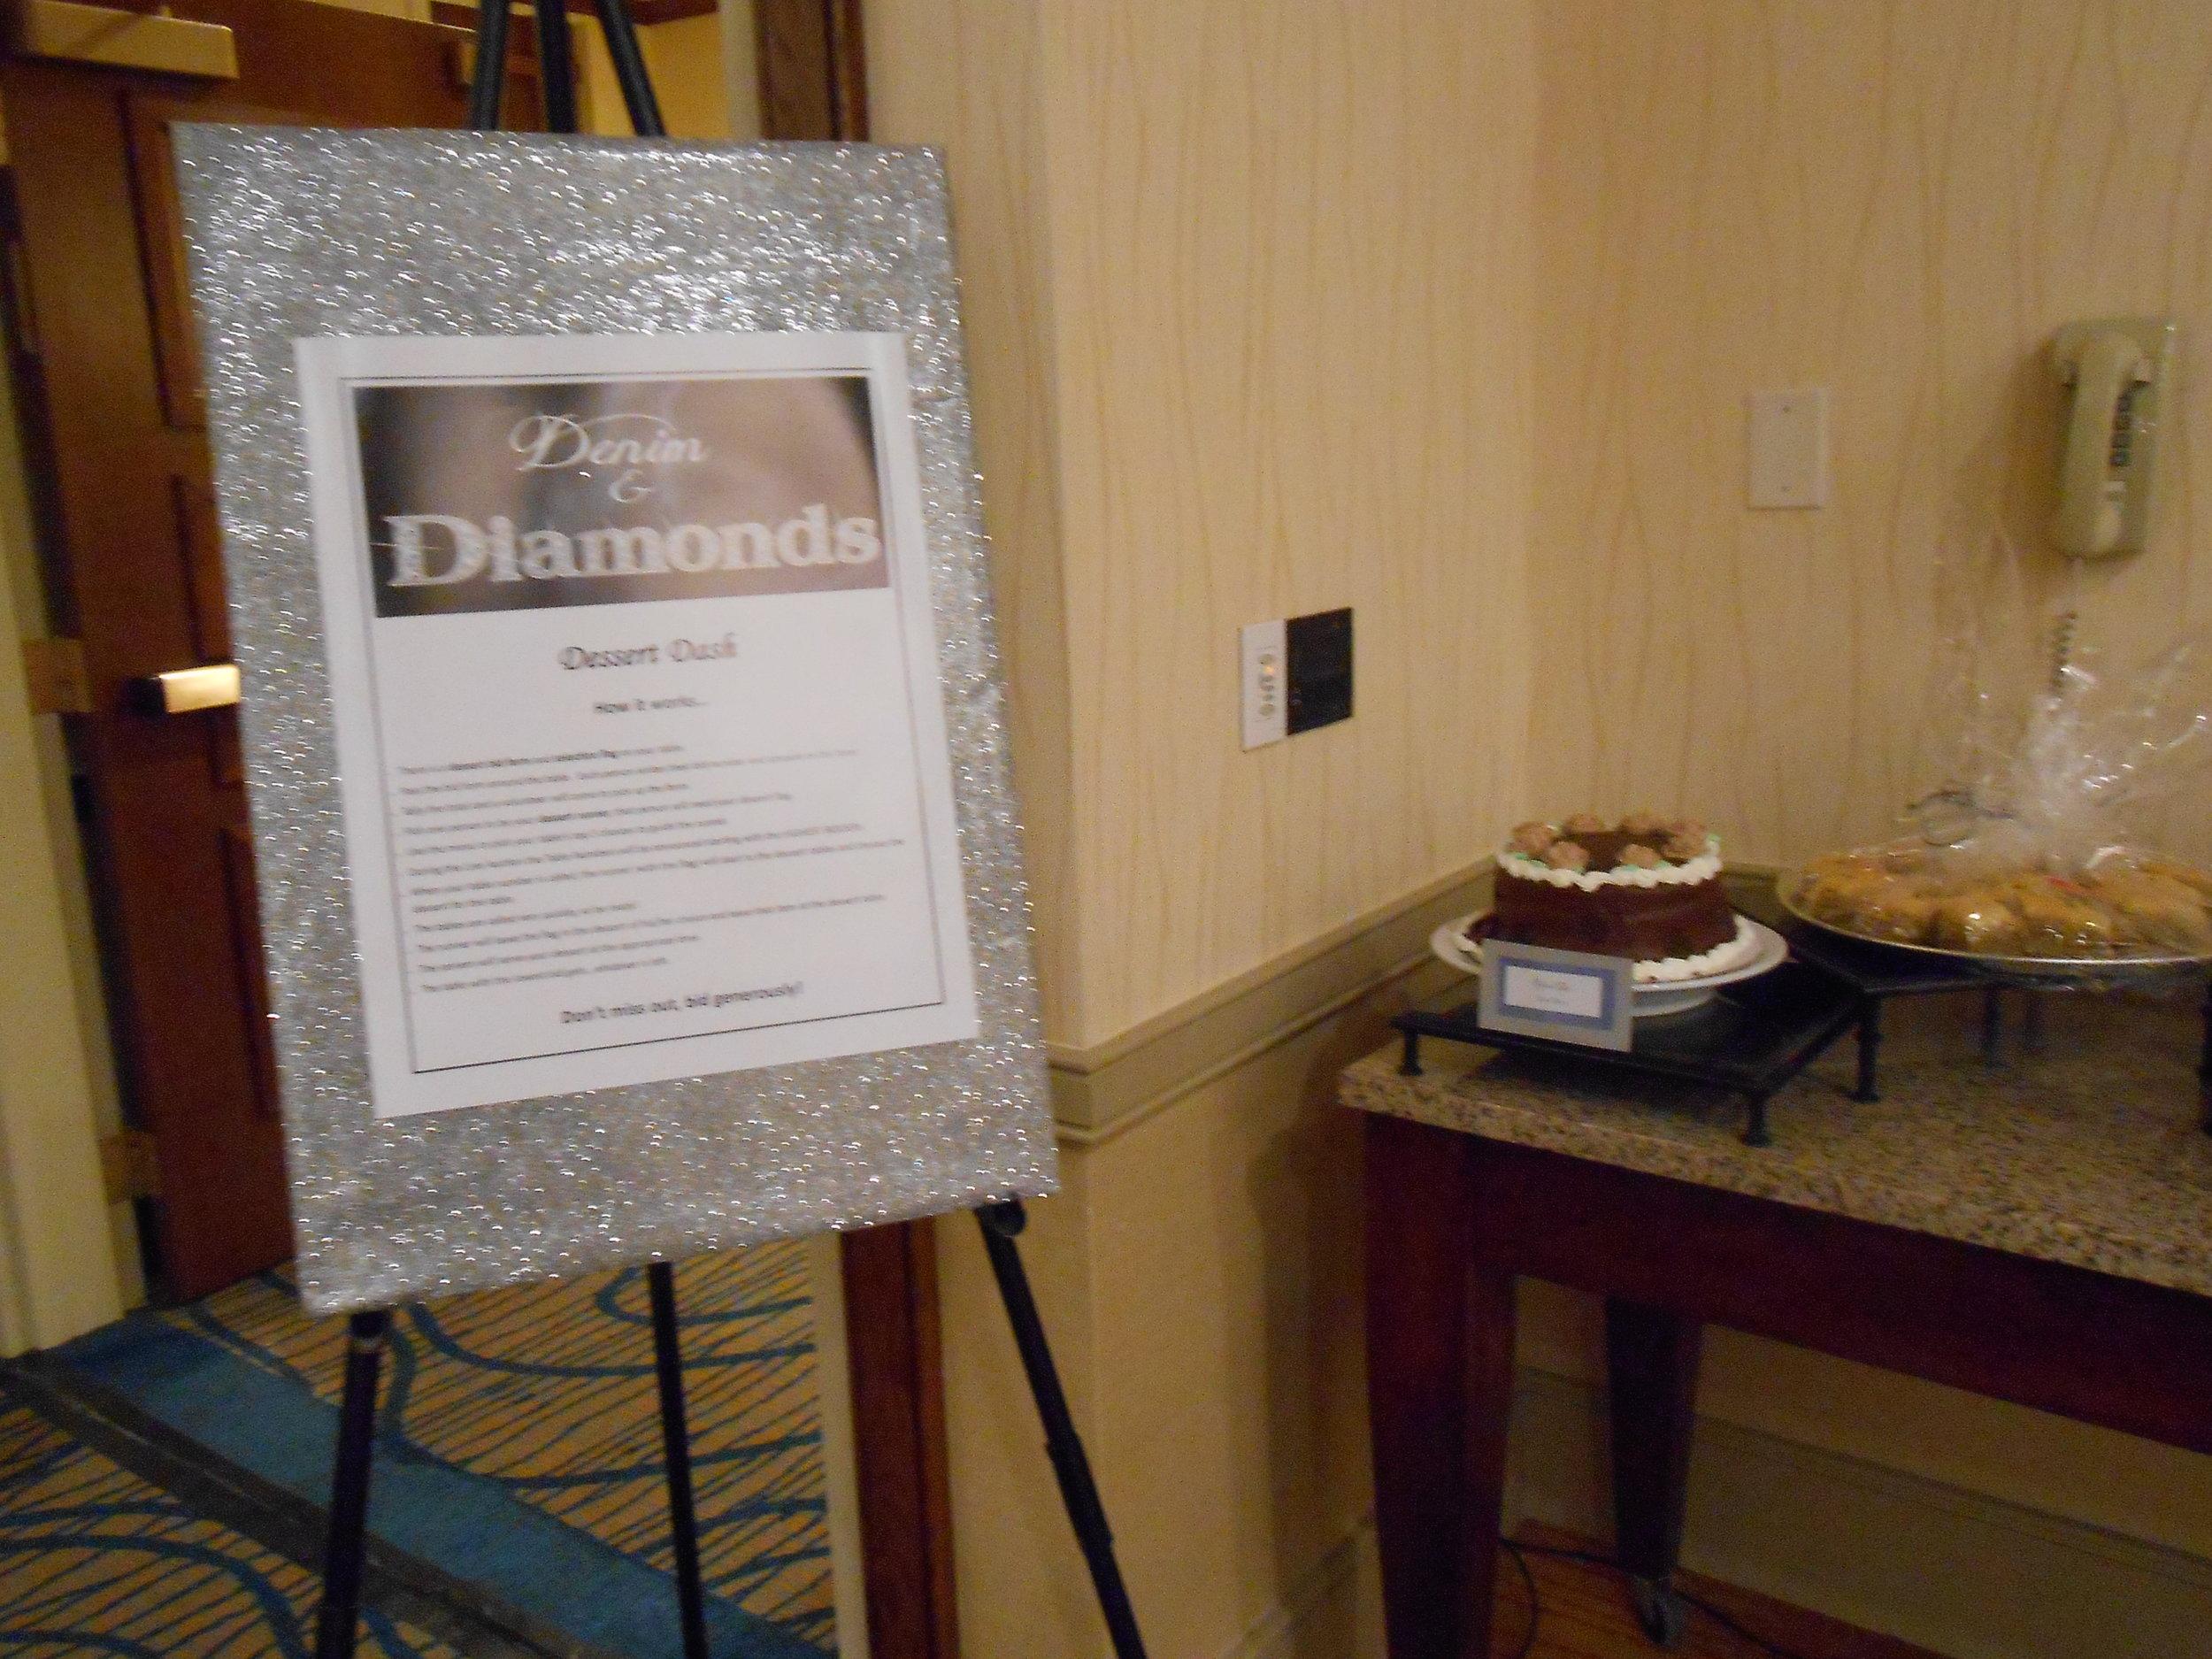 Denim and Diamons Signs Dessert DAsh220.jpg